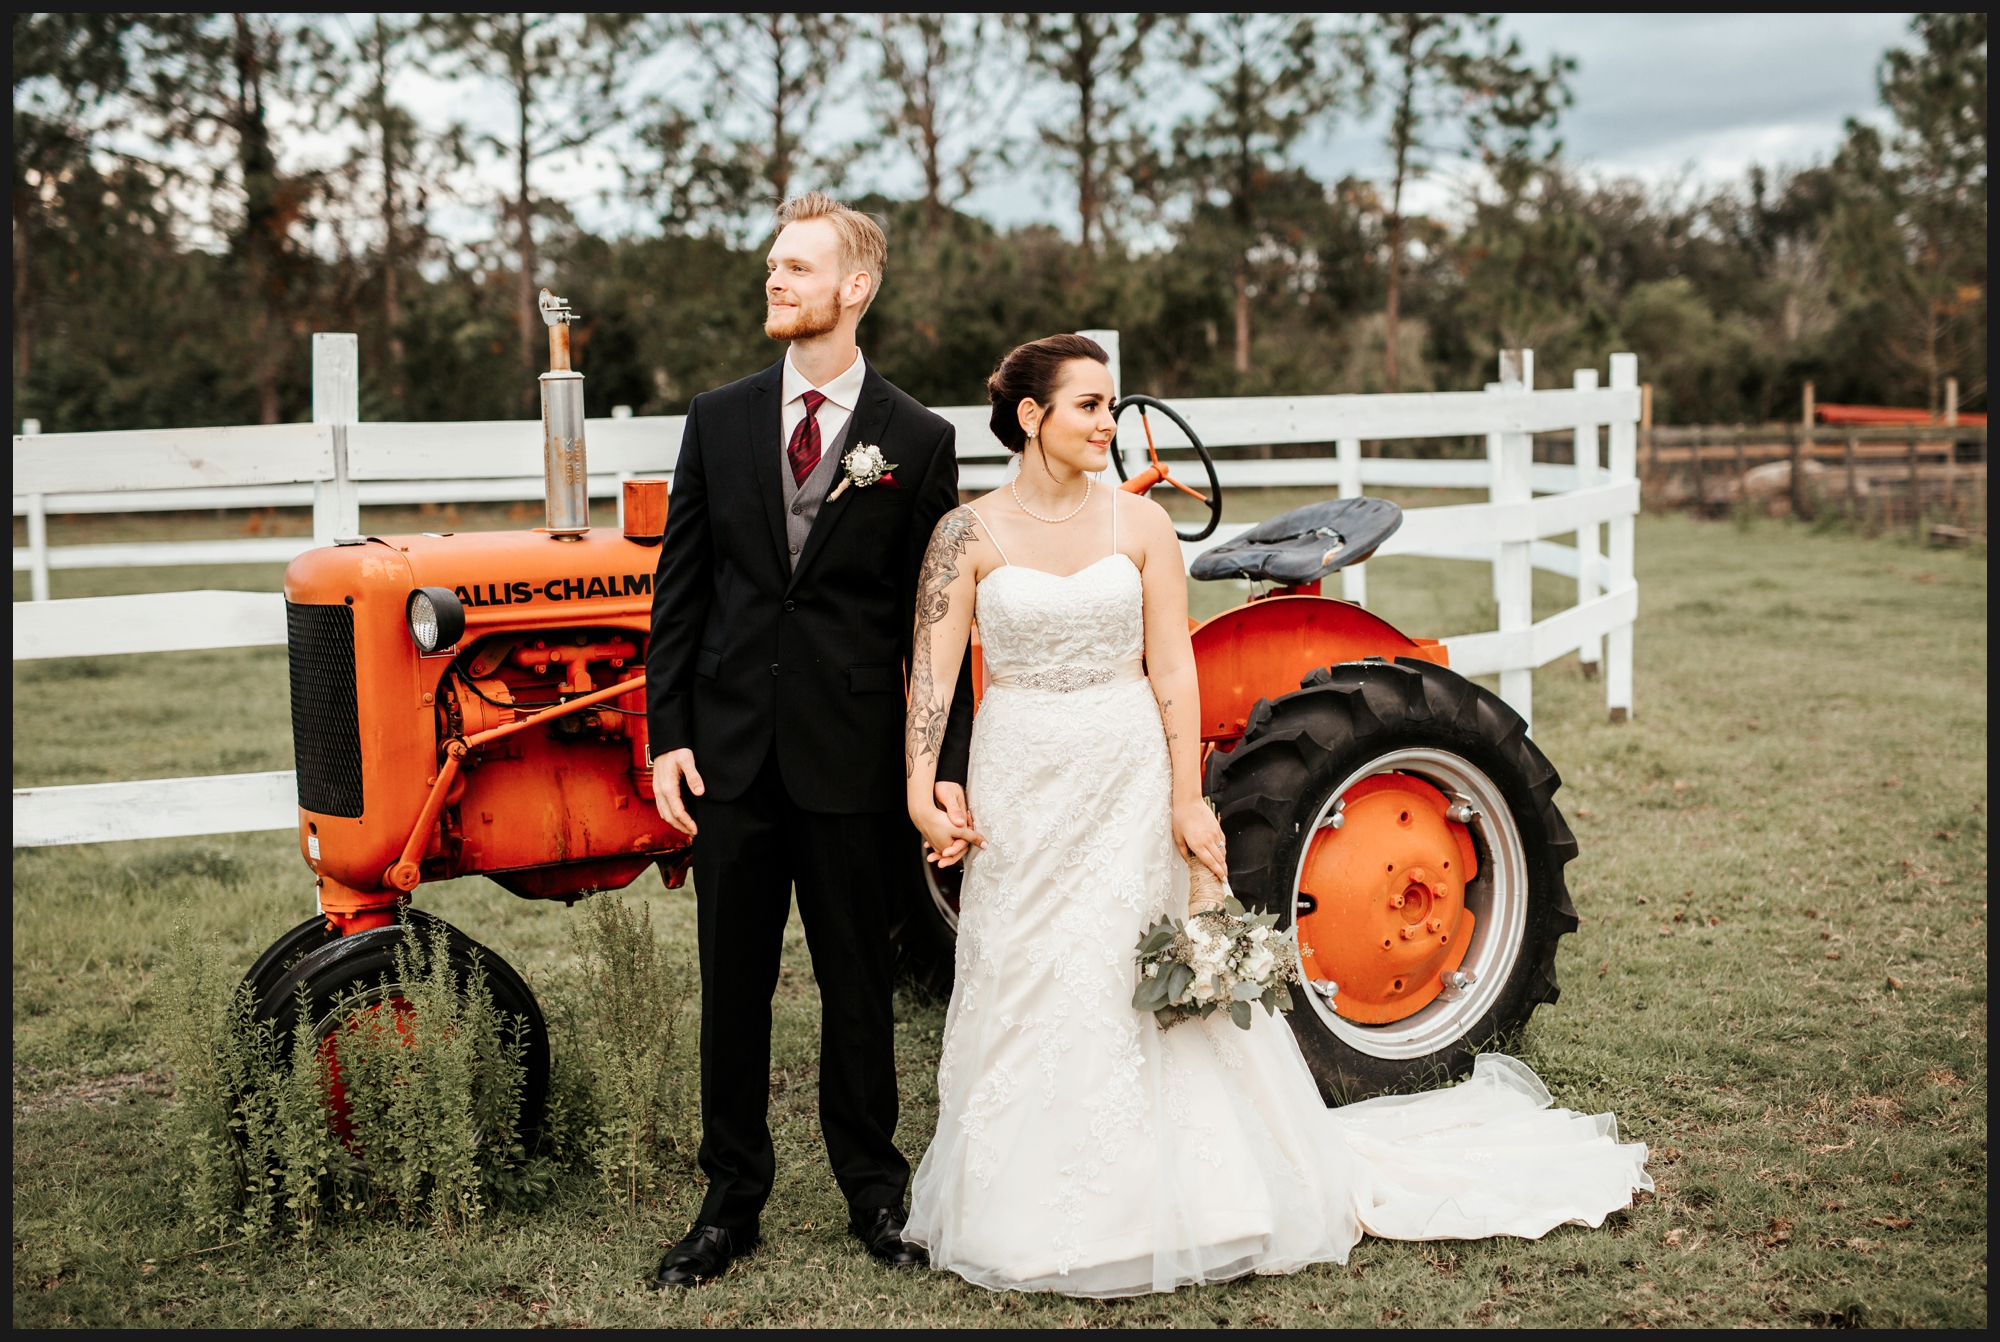 Orlando-Wedding-Photographer-destination-wedding-photographer-florida-wedding-photographer-bohemian-wedding-photographer_0361.jpg